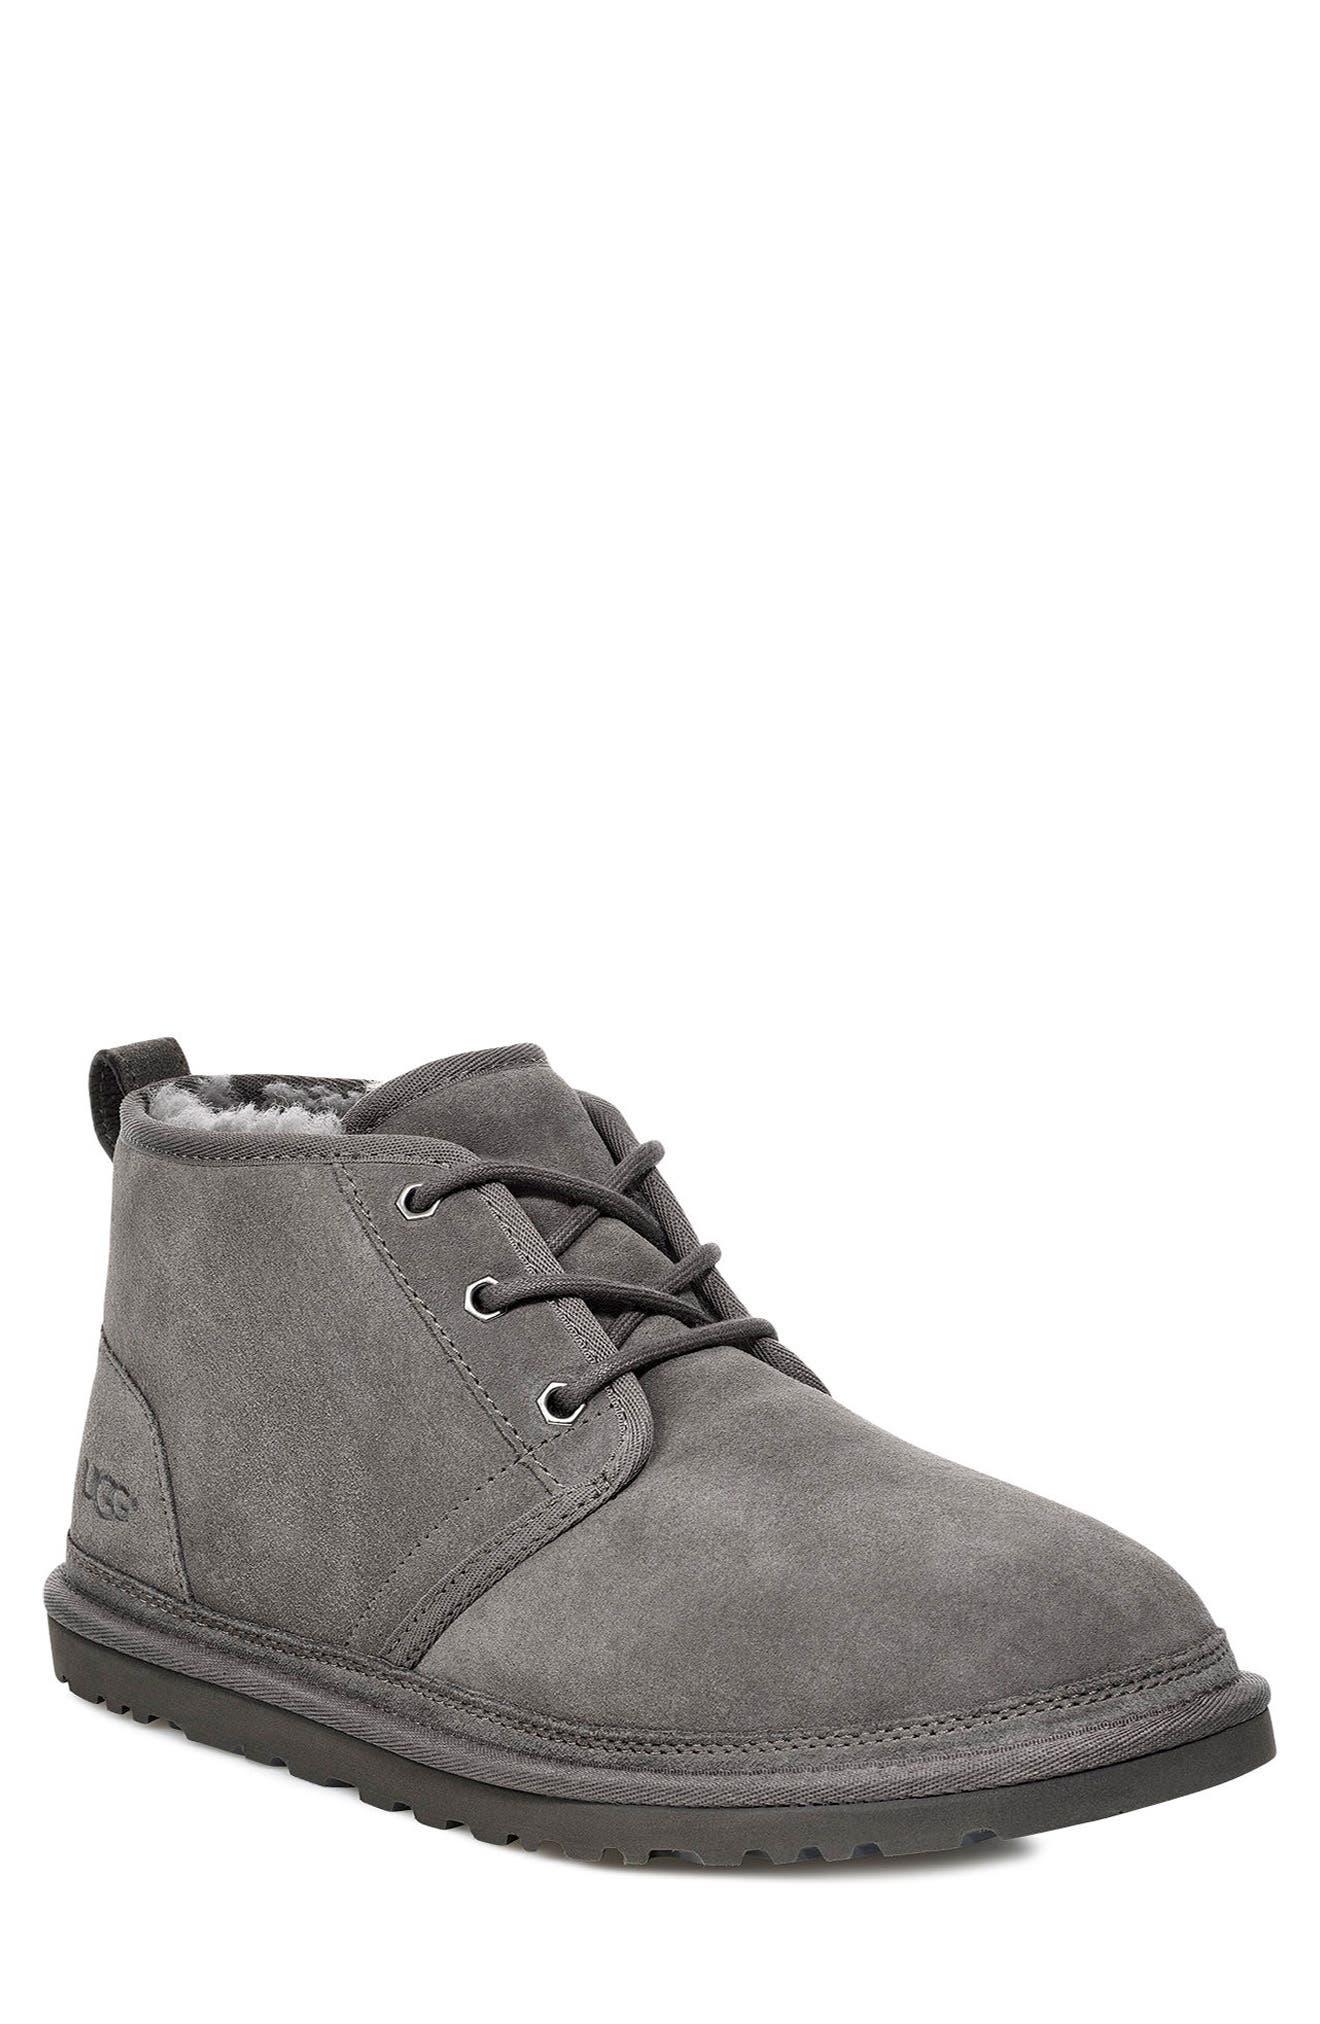 grey all ugg australia nordstrom rh shop nordstrom com